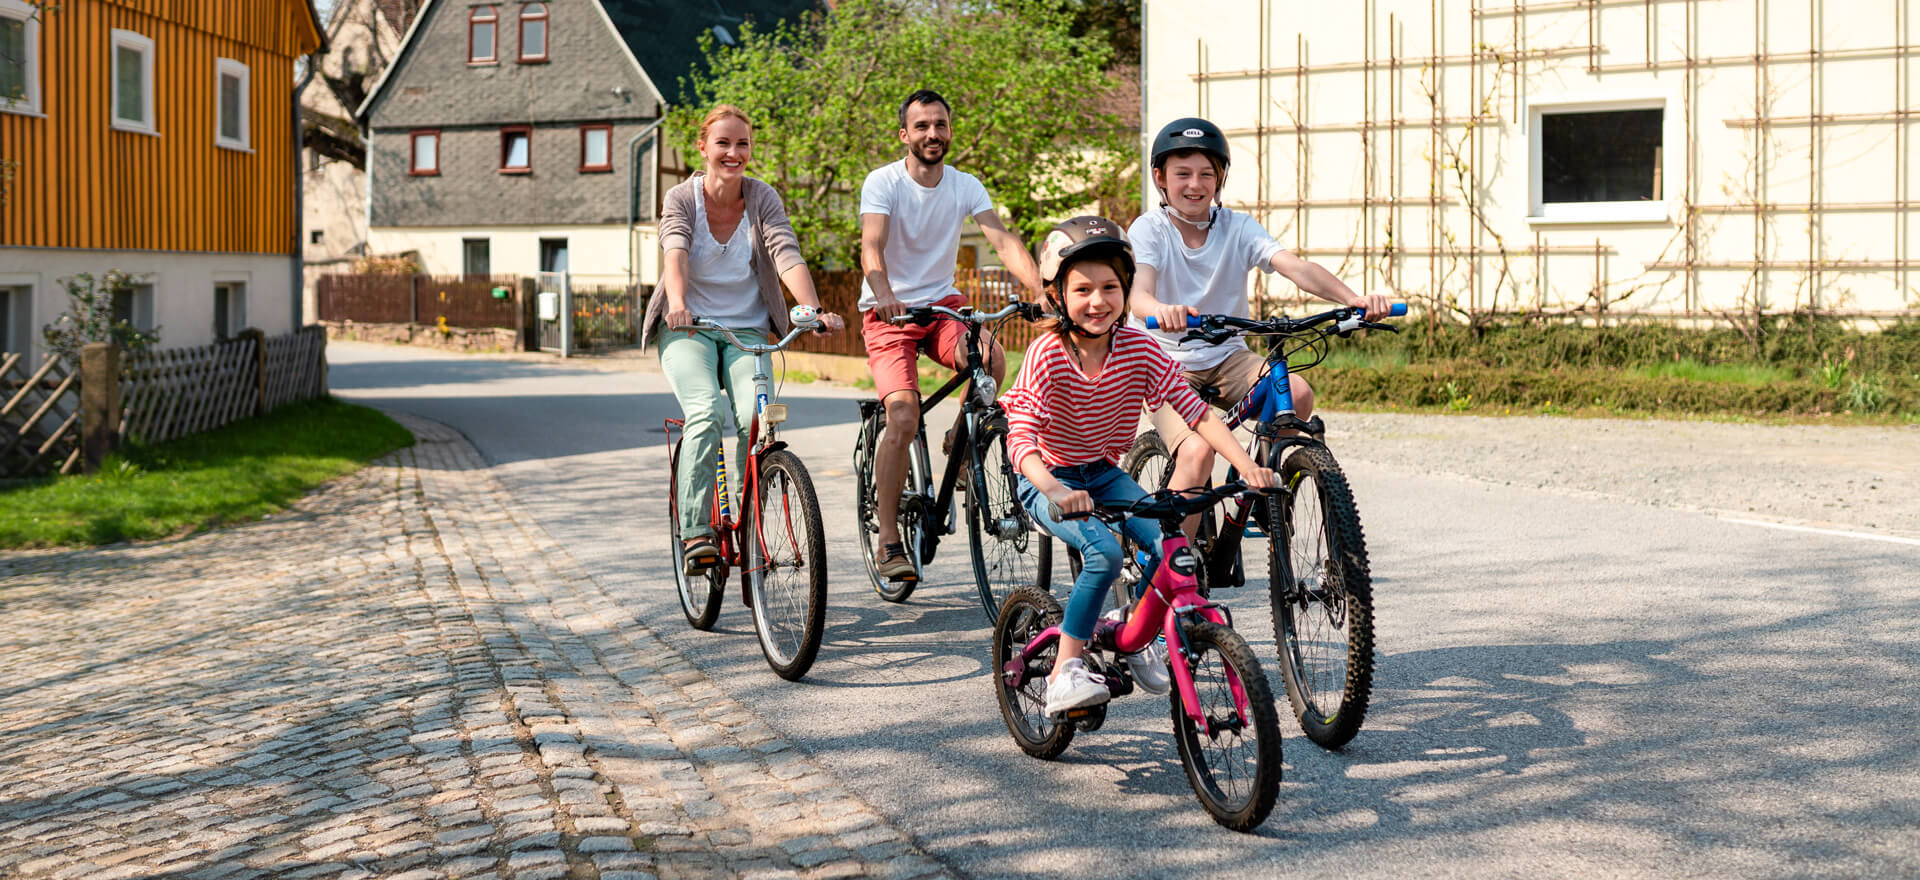 Beitragsbild - Fahrradmotiv